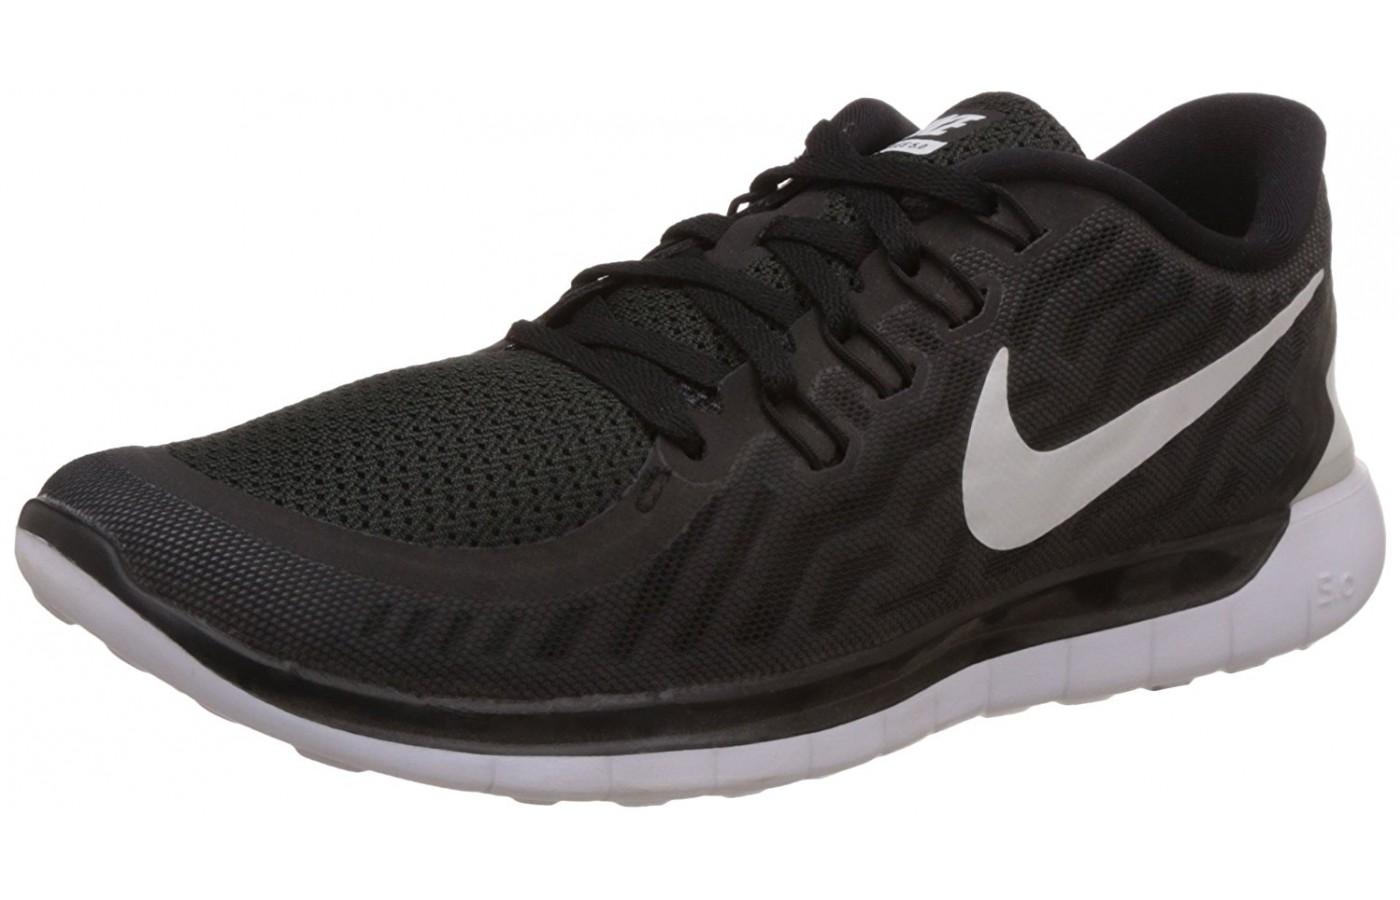 Nike Pas Libre 5.0